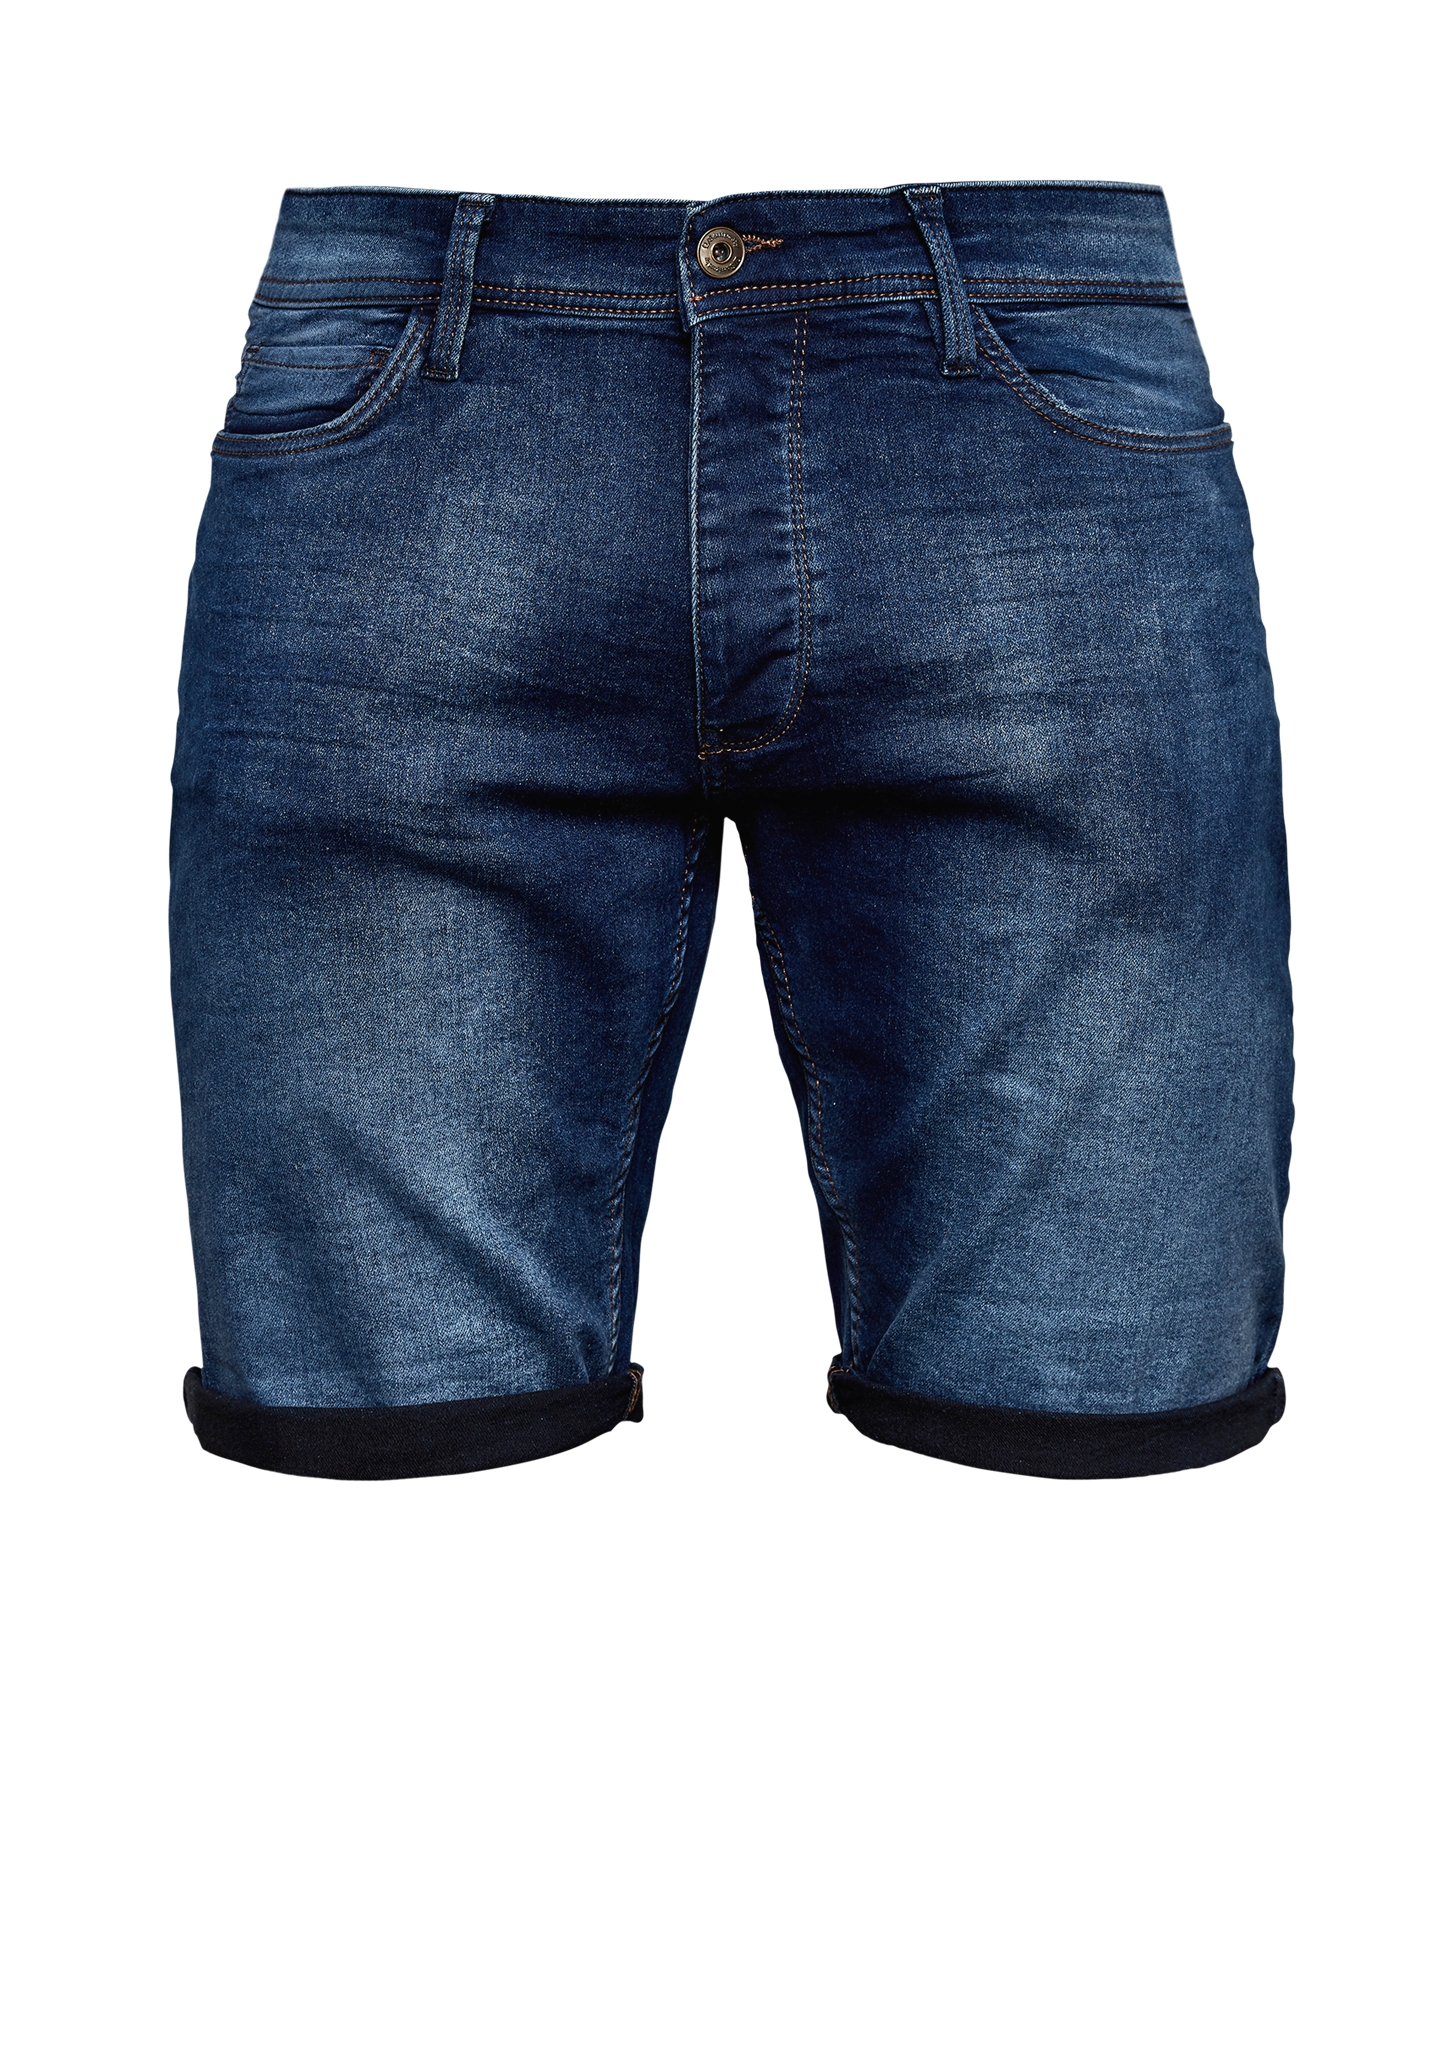 Denim-Shorts | Bekleidung > Shorts & Bermudas > Shorts | Blau | 82% baumwolle -  17% polyester -  1% elasthan | Q/S designed by